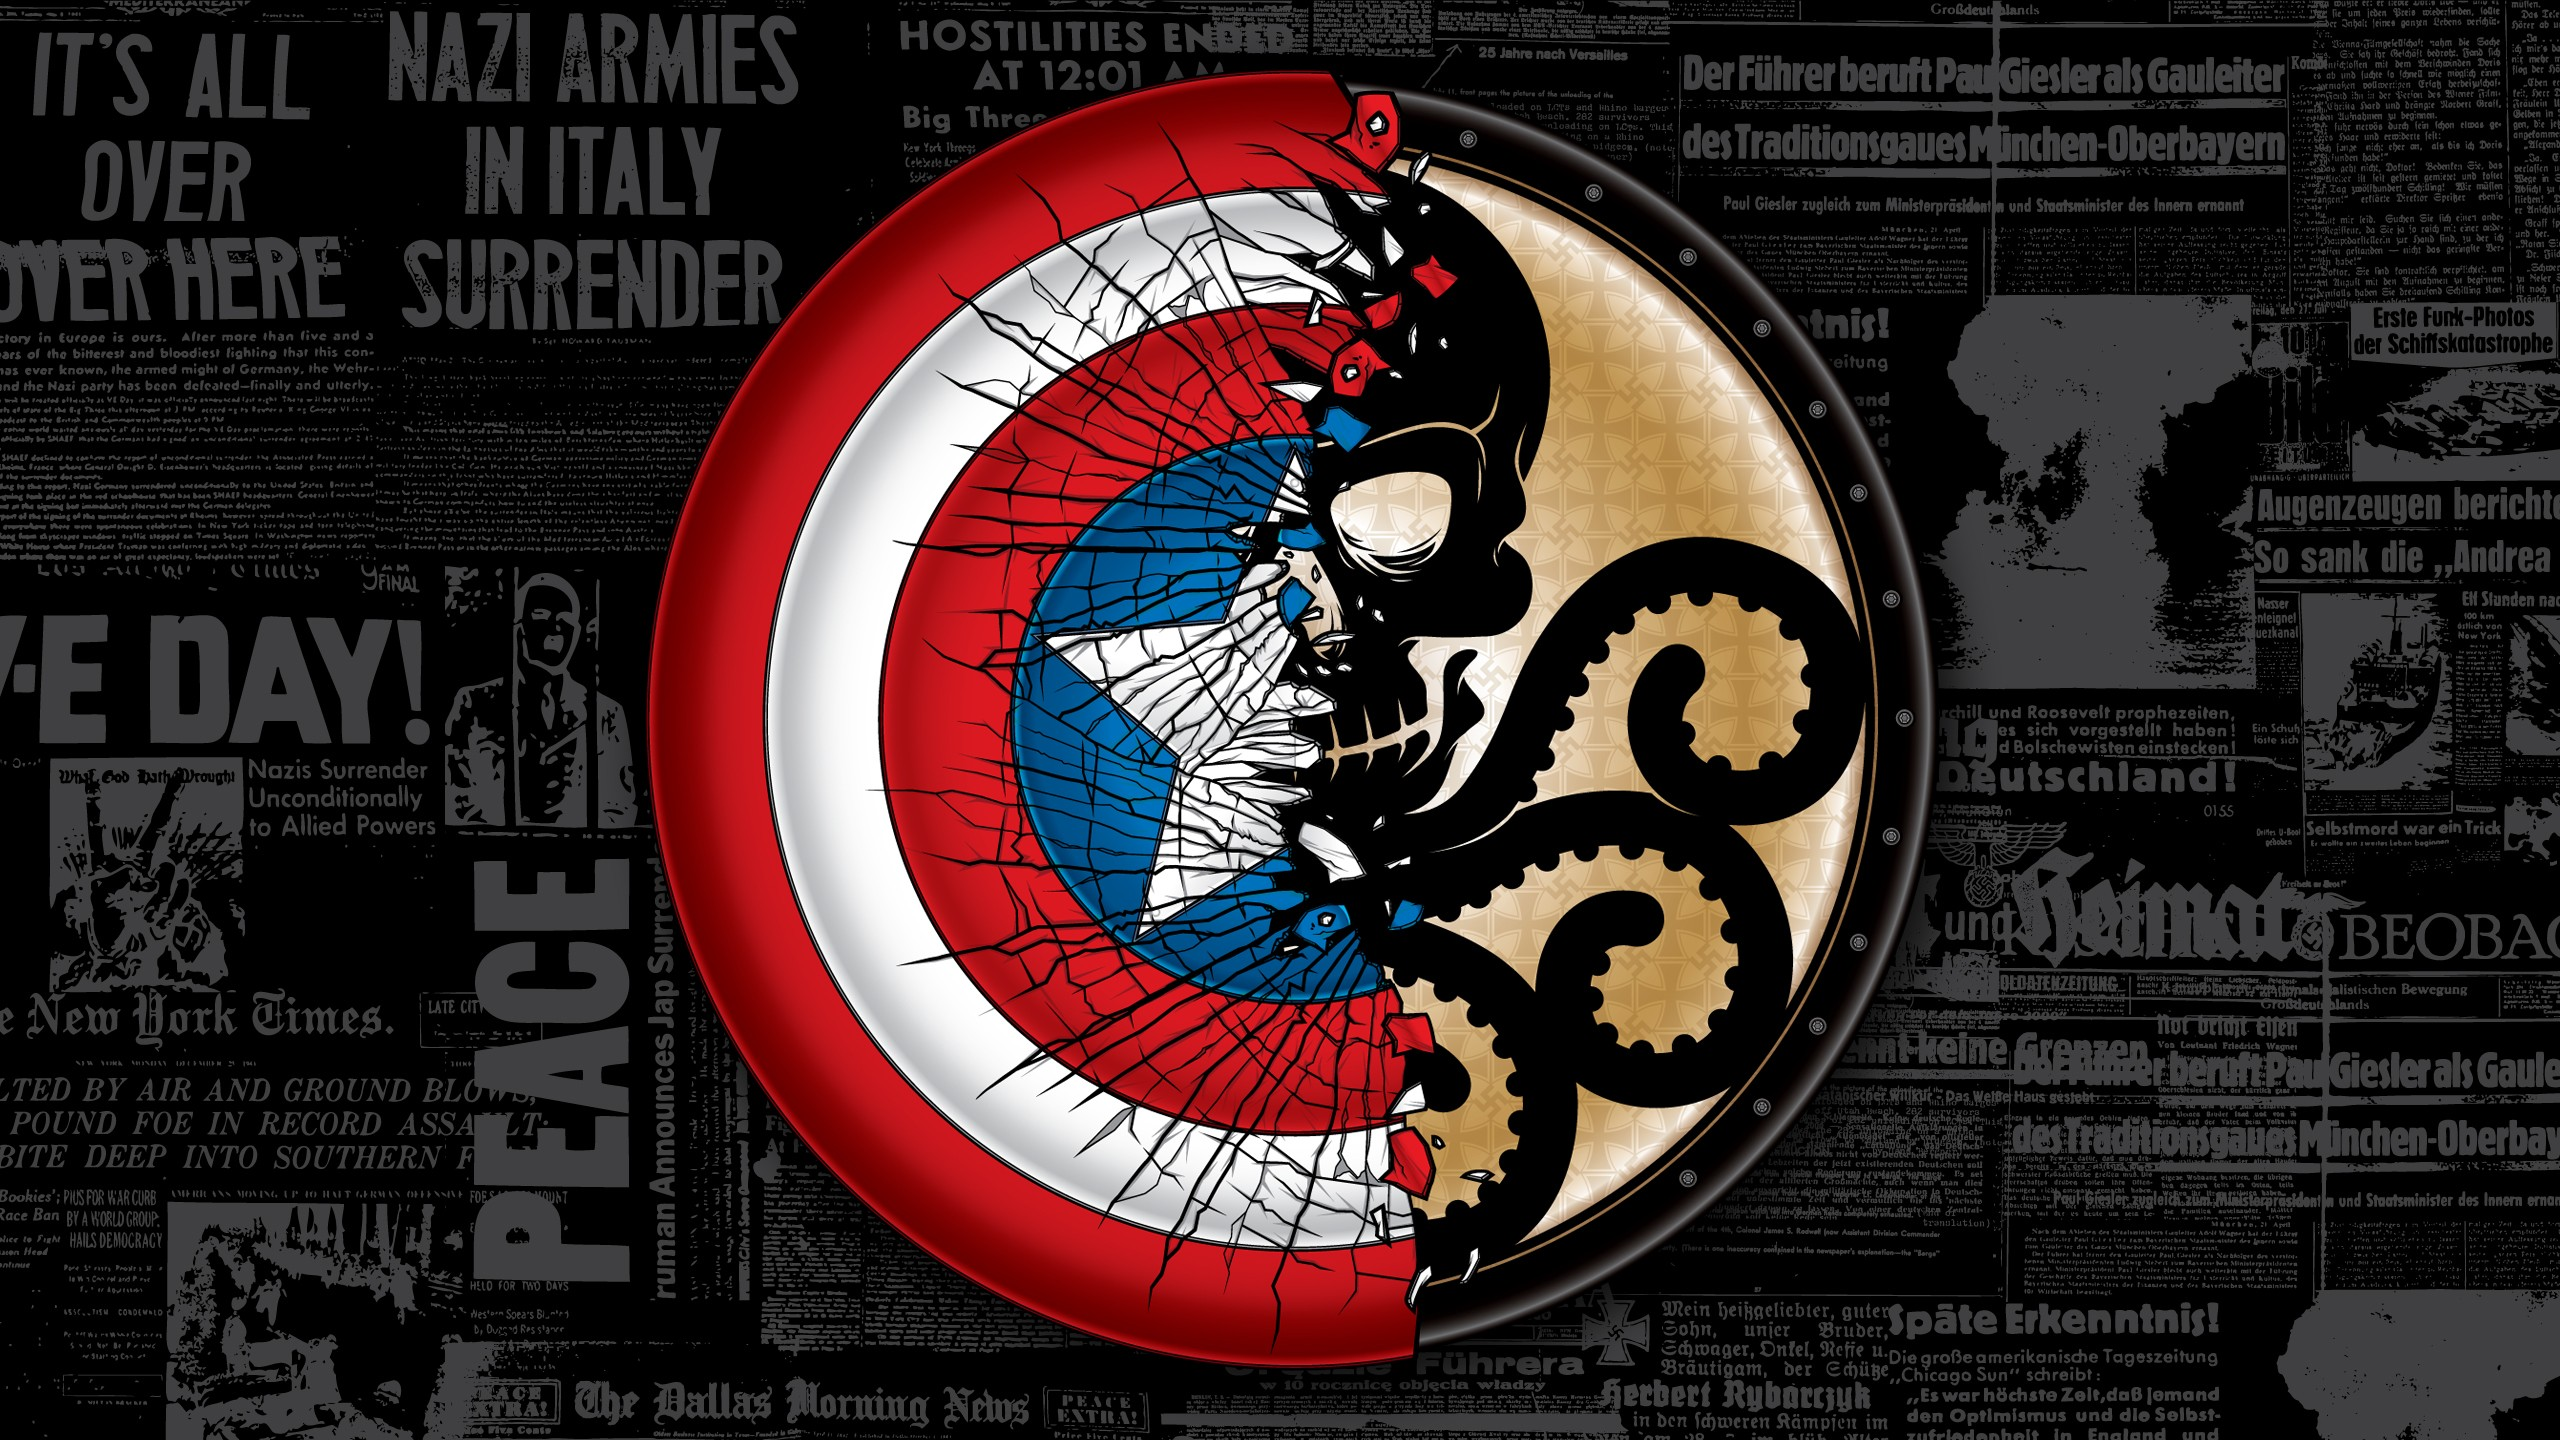 Captain America Computer Wallpapers Desktop Backgrounds 2560x1440 2560x1440